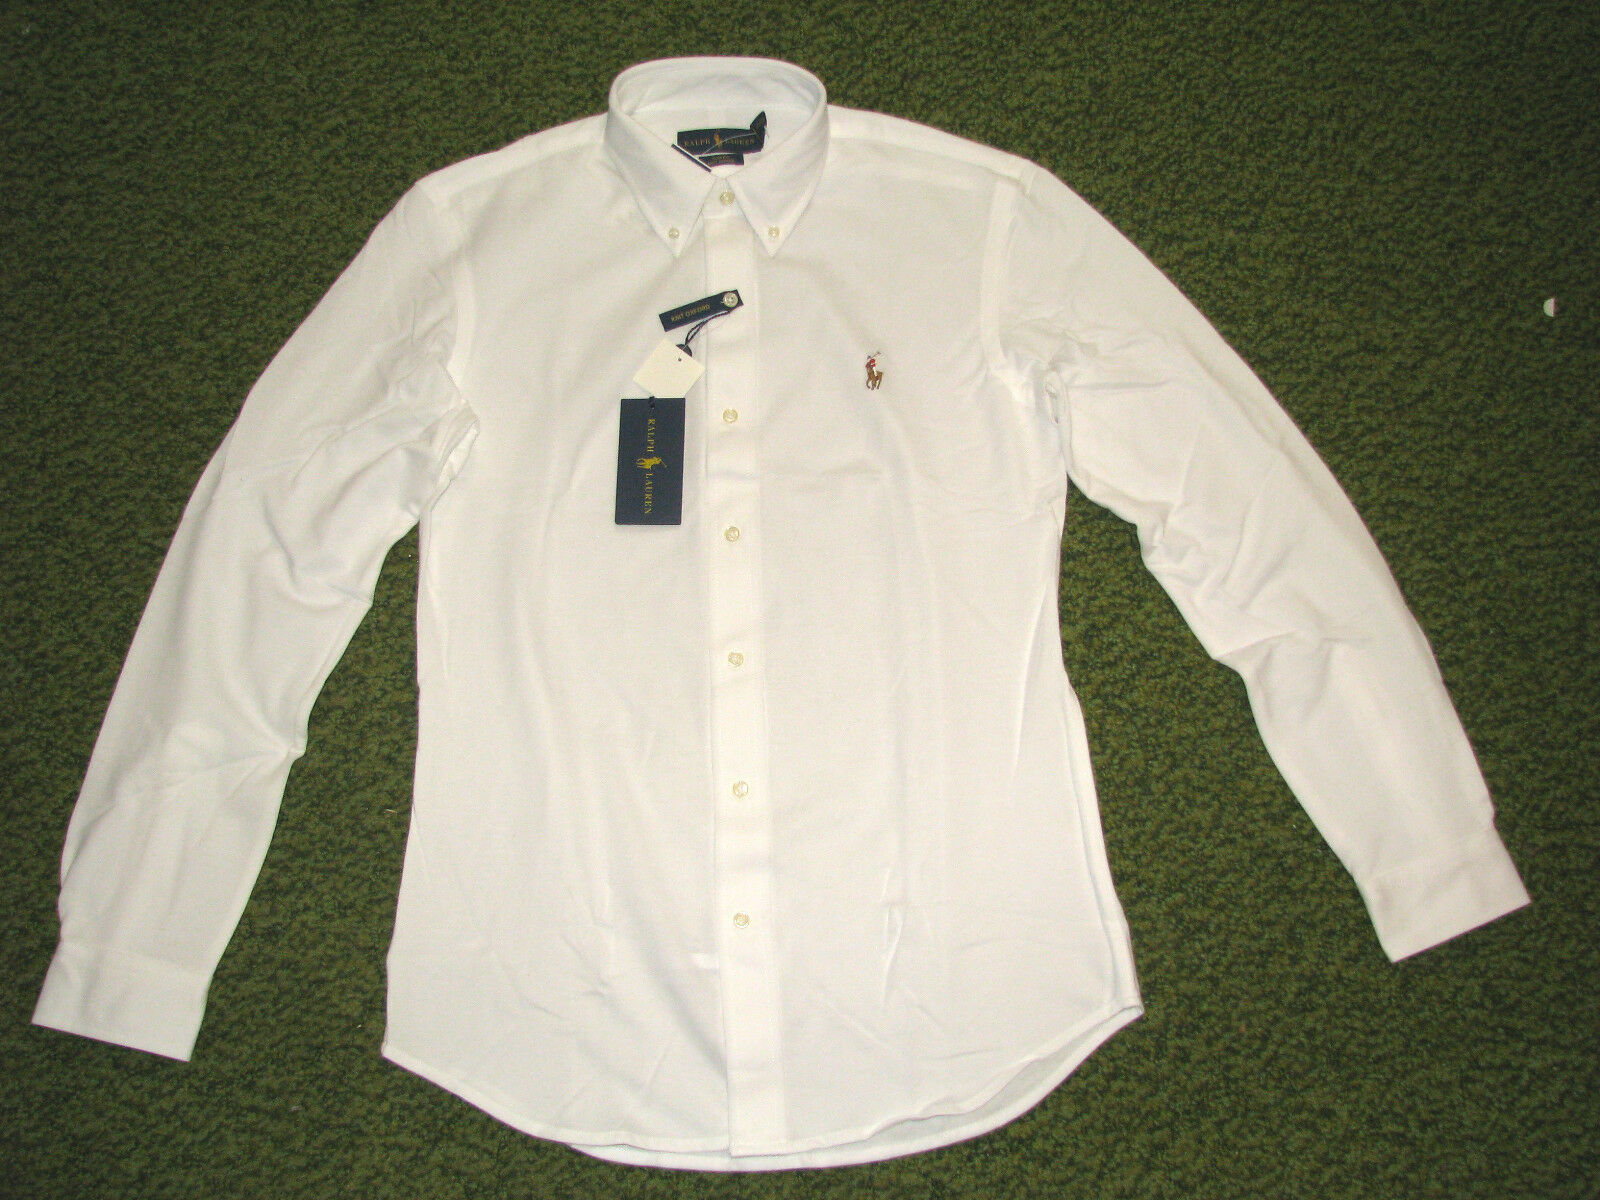 Homme (xxl) Polo-ralph Lauren Blanc Tricot Piqué Chemise Oxford   eBay 72229f14b4f